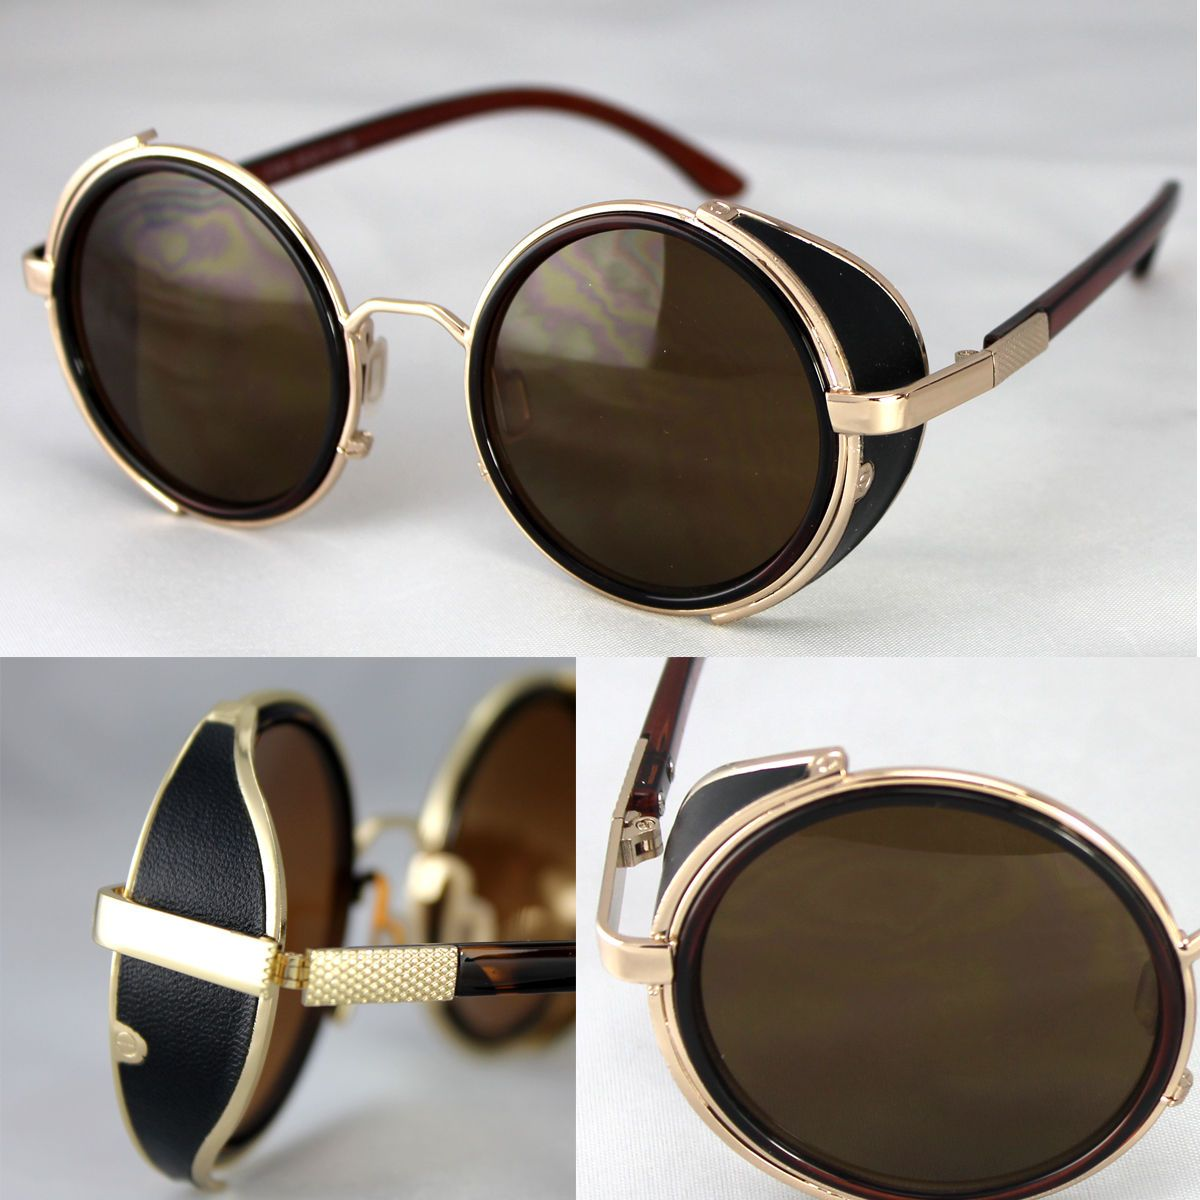 Gold Flip up Circle Steampunk Glasses Goggles Cyber Round Sunglasses UK Black